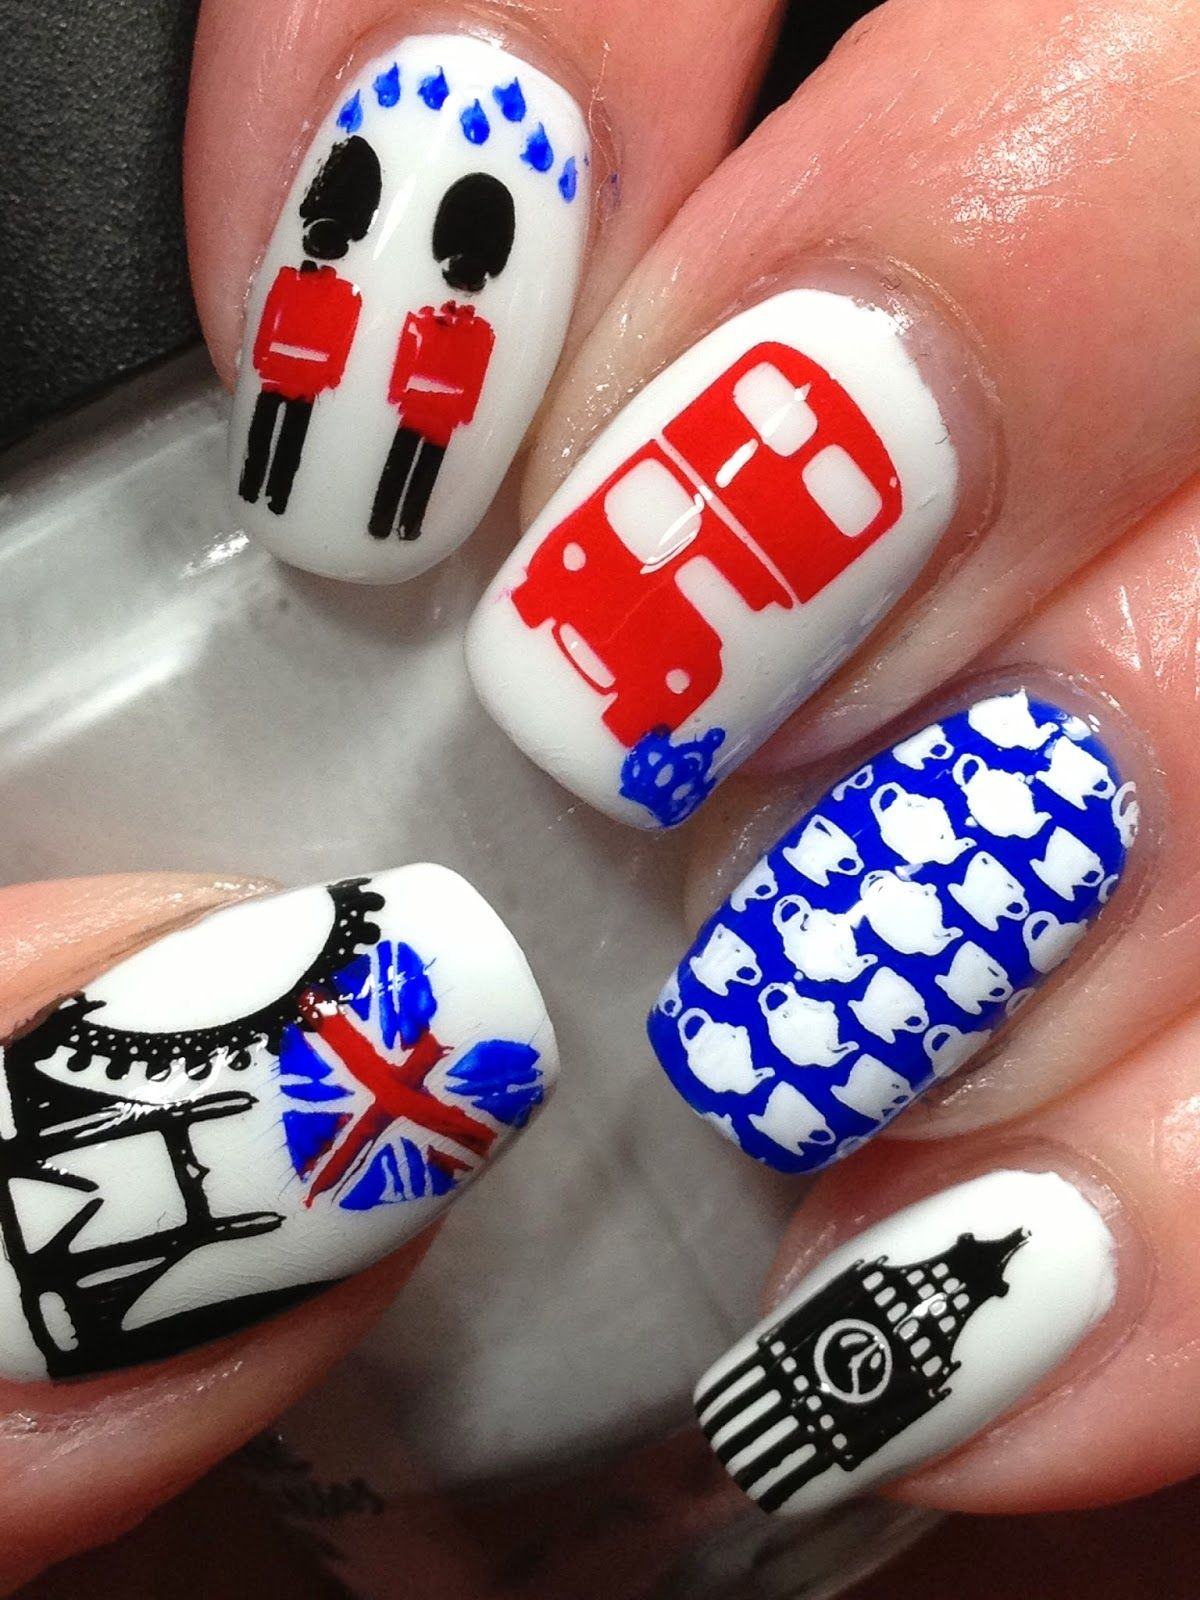 With tardis for kelli girly pinterest london nails nail girly pinterest london nails nail nail and makeup prinsesfo Gallery